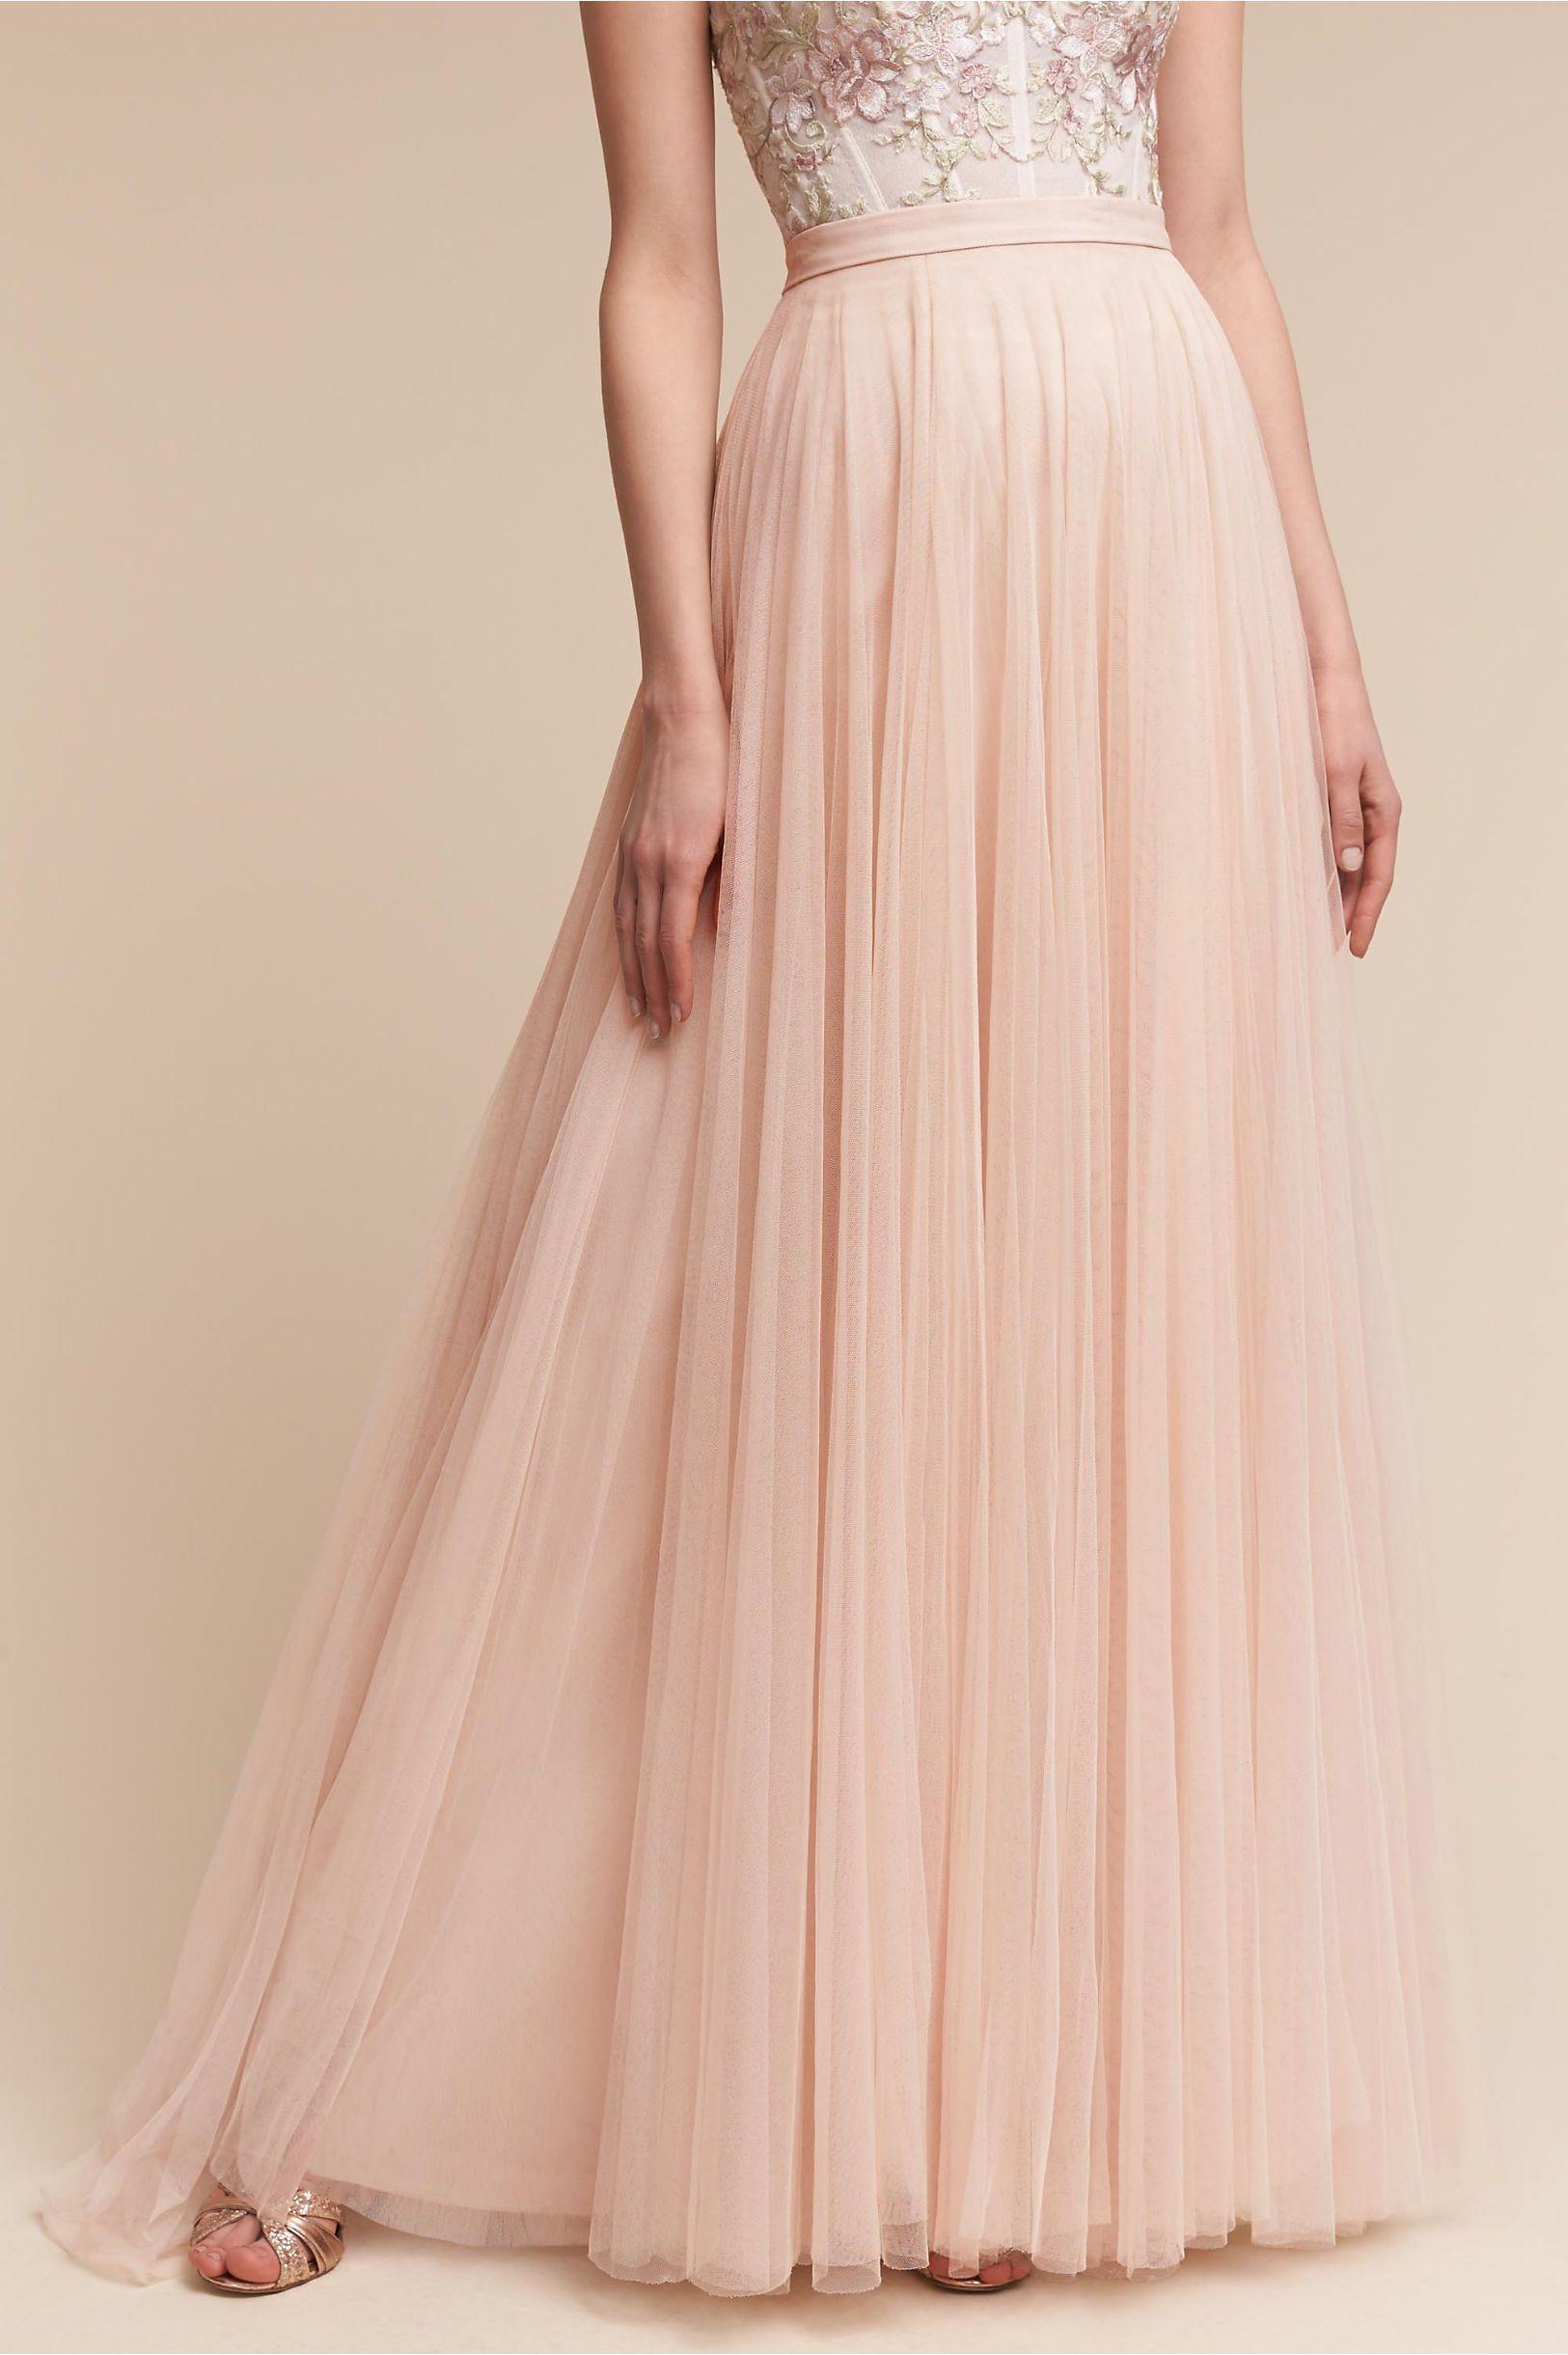 Build your own wedding dress  BHLDN Amora Skirt in Bride  BHLDN  Wedding Gowns  Pinterest